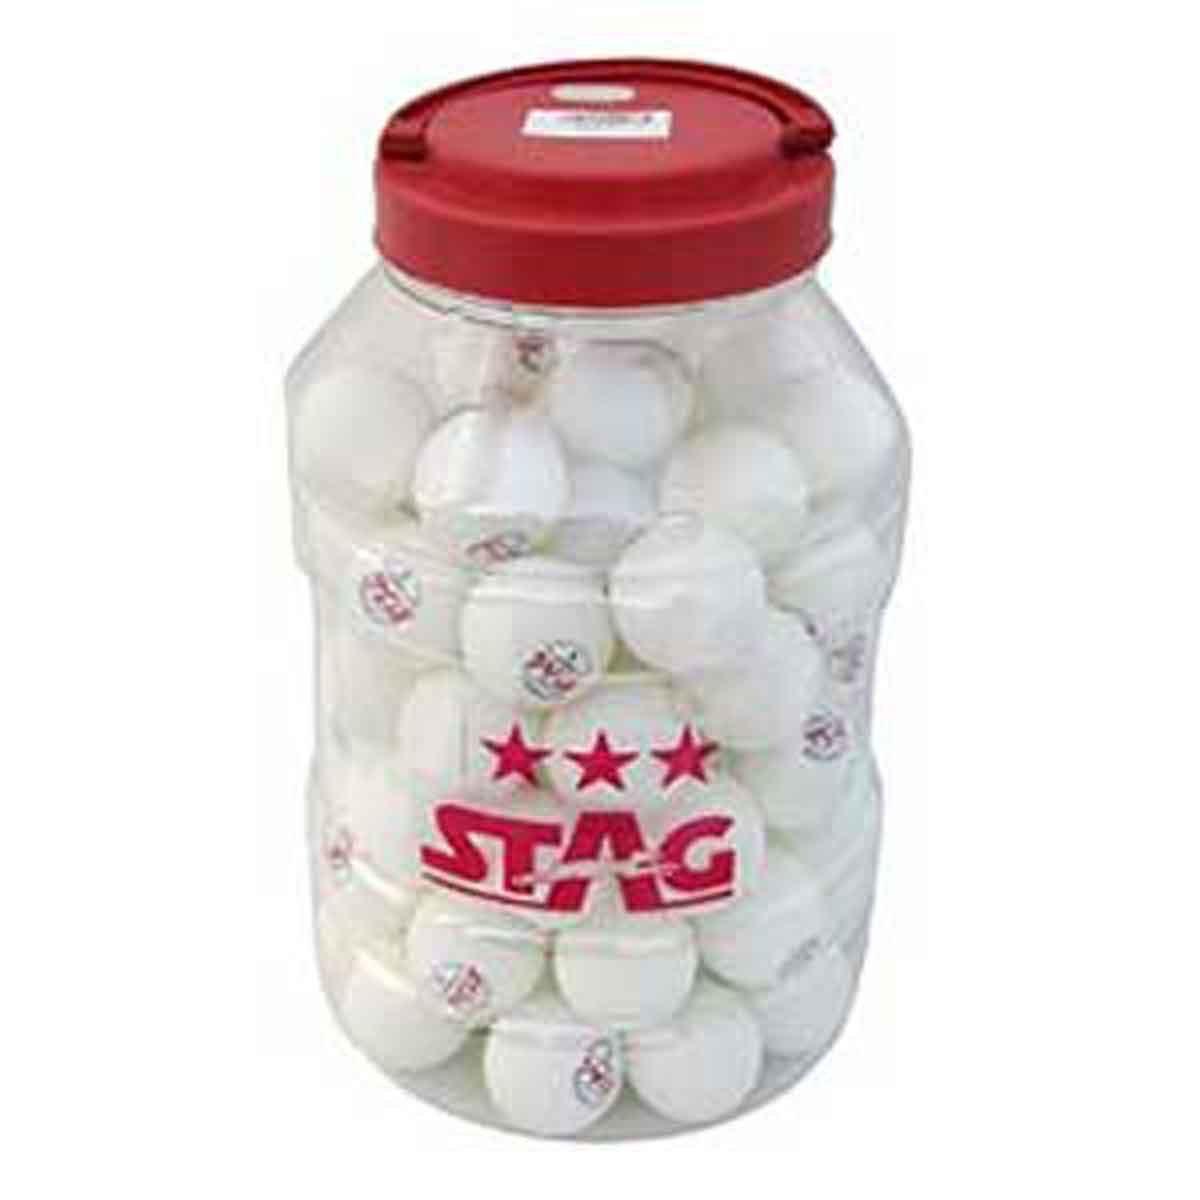 Buy Stag 3 Star Premium White Table Tennis Balls 72 Pack